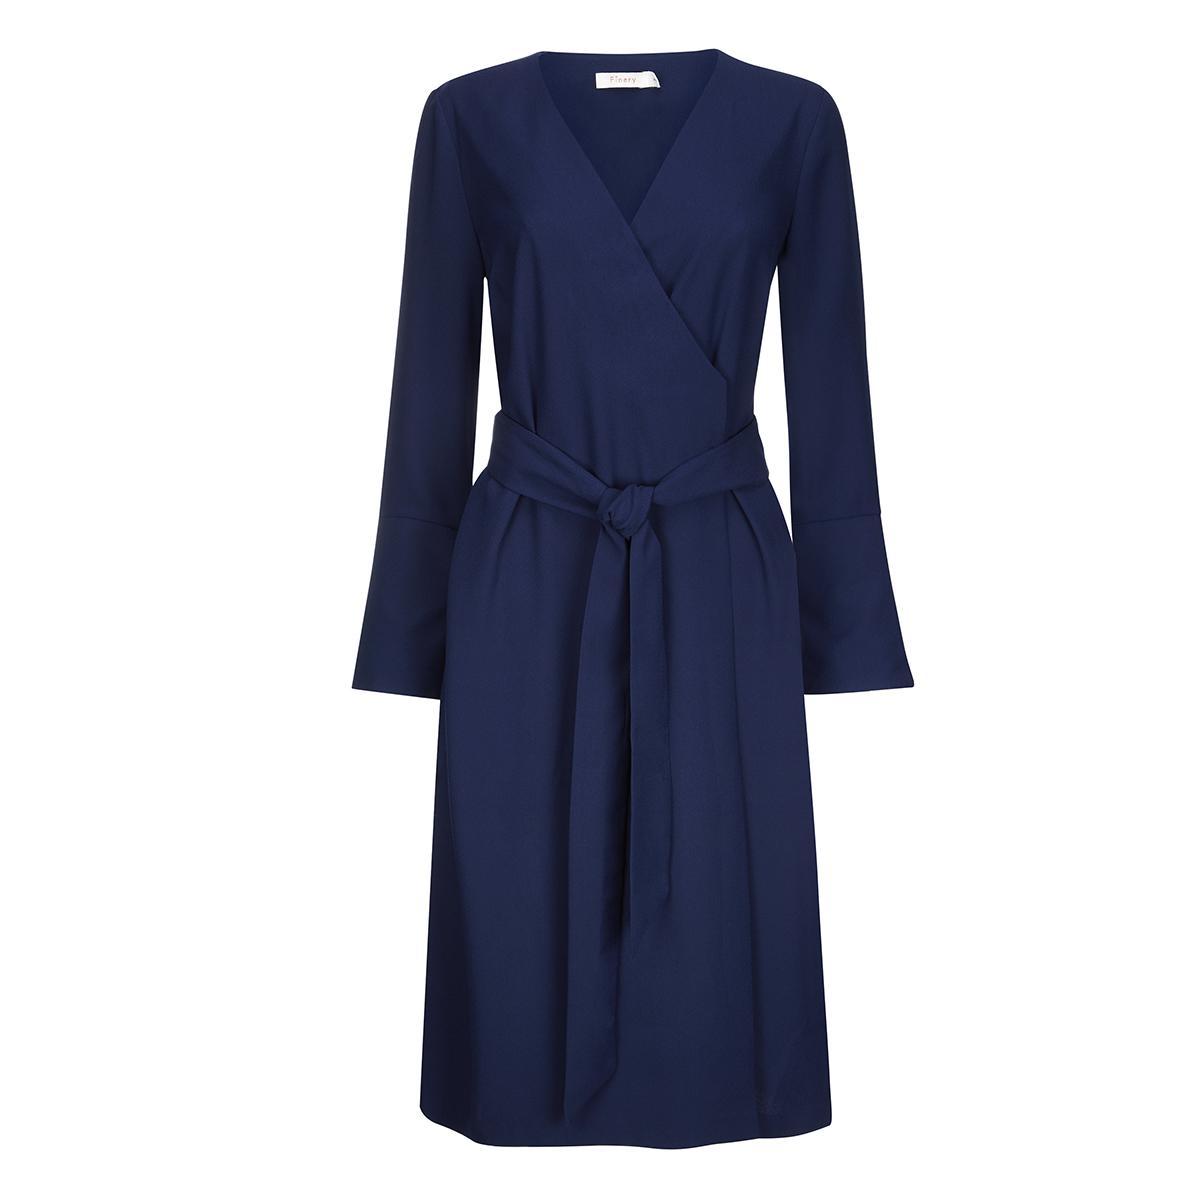 Gervase Midnight Blue Wrap Dress Finery Huge Range Of Cheap For Nice Really Sale Online lJnAAz